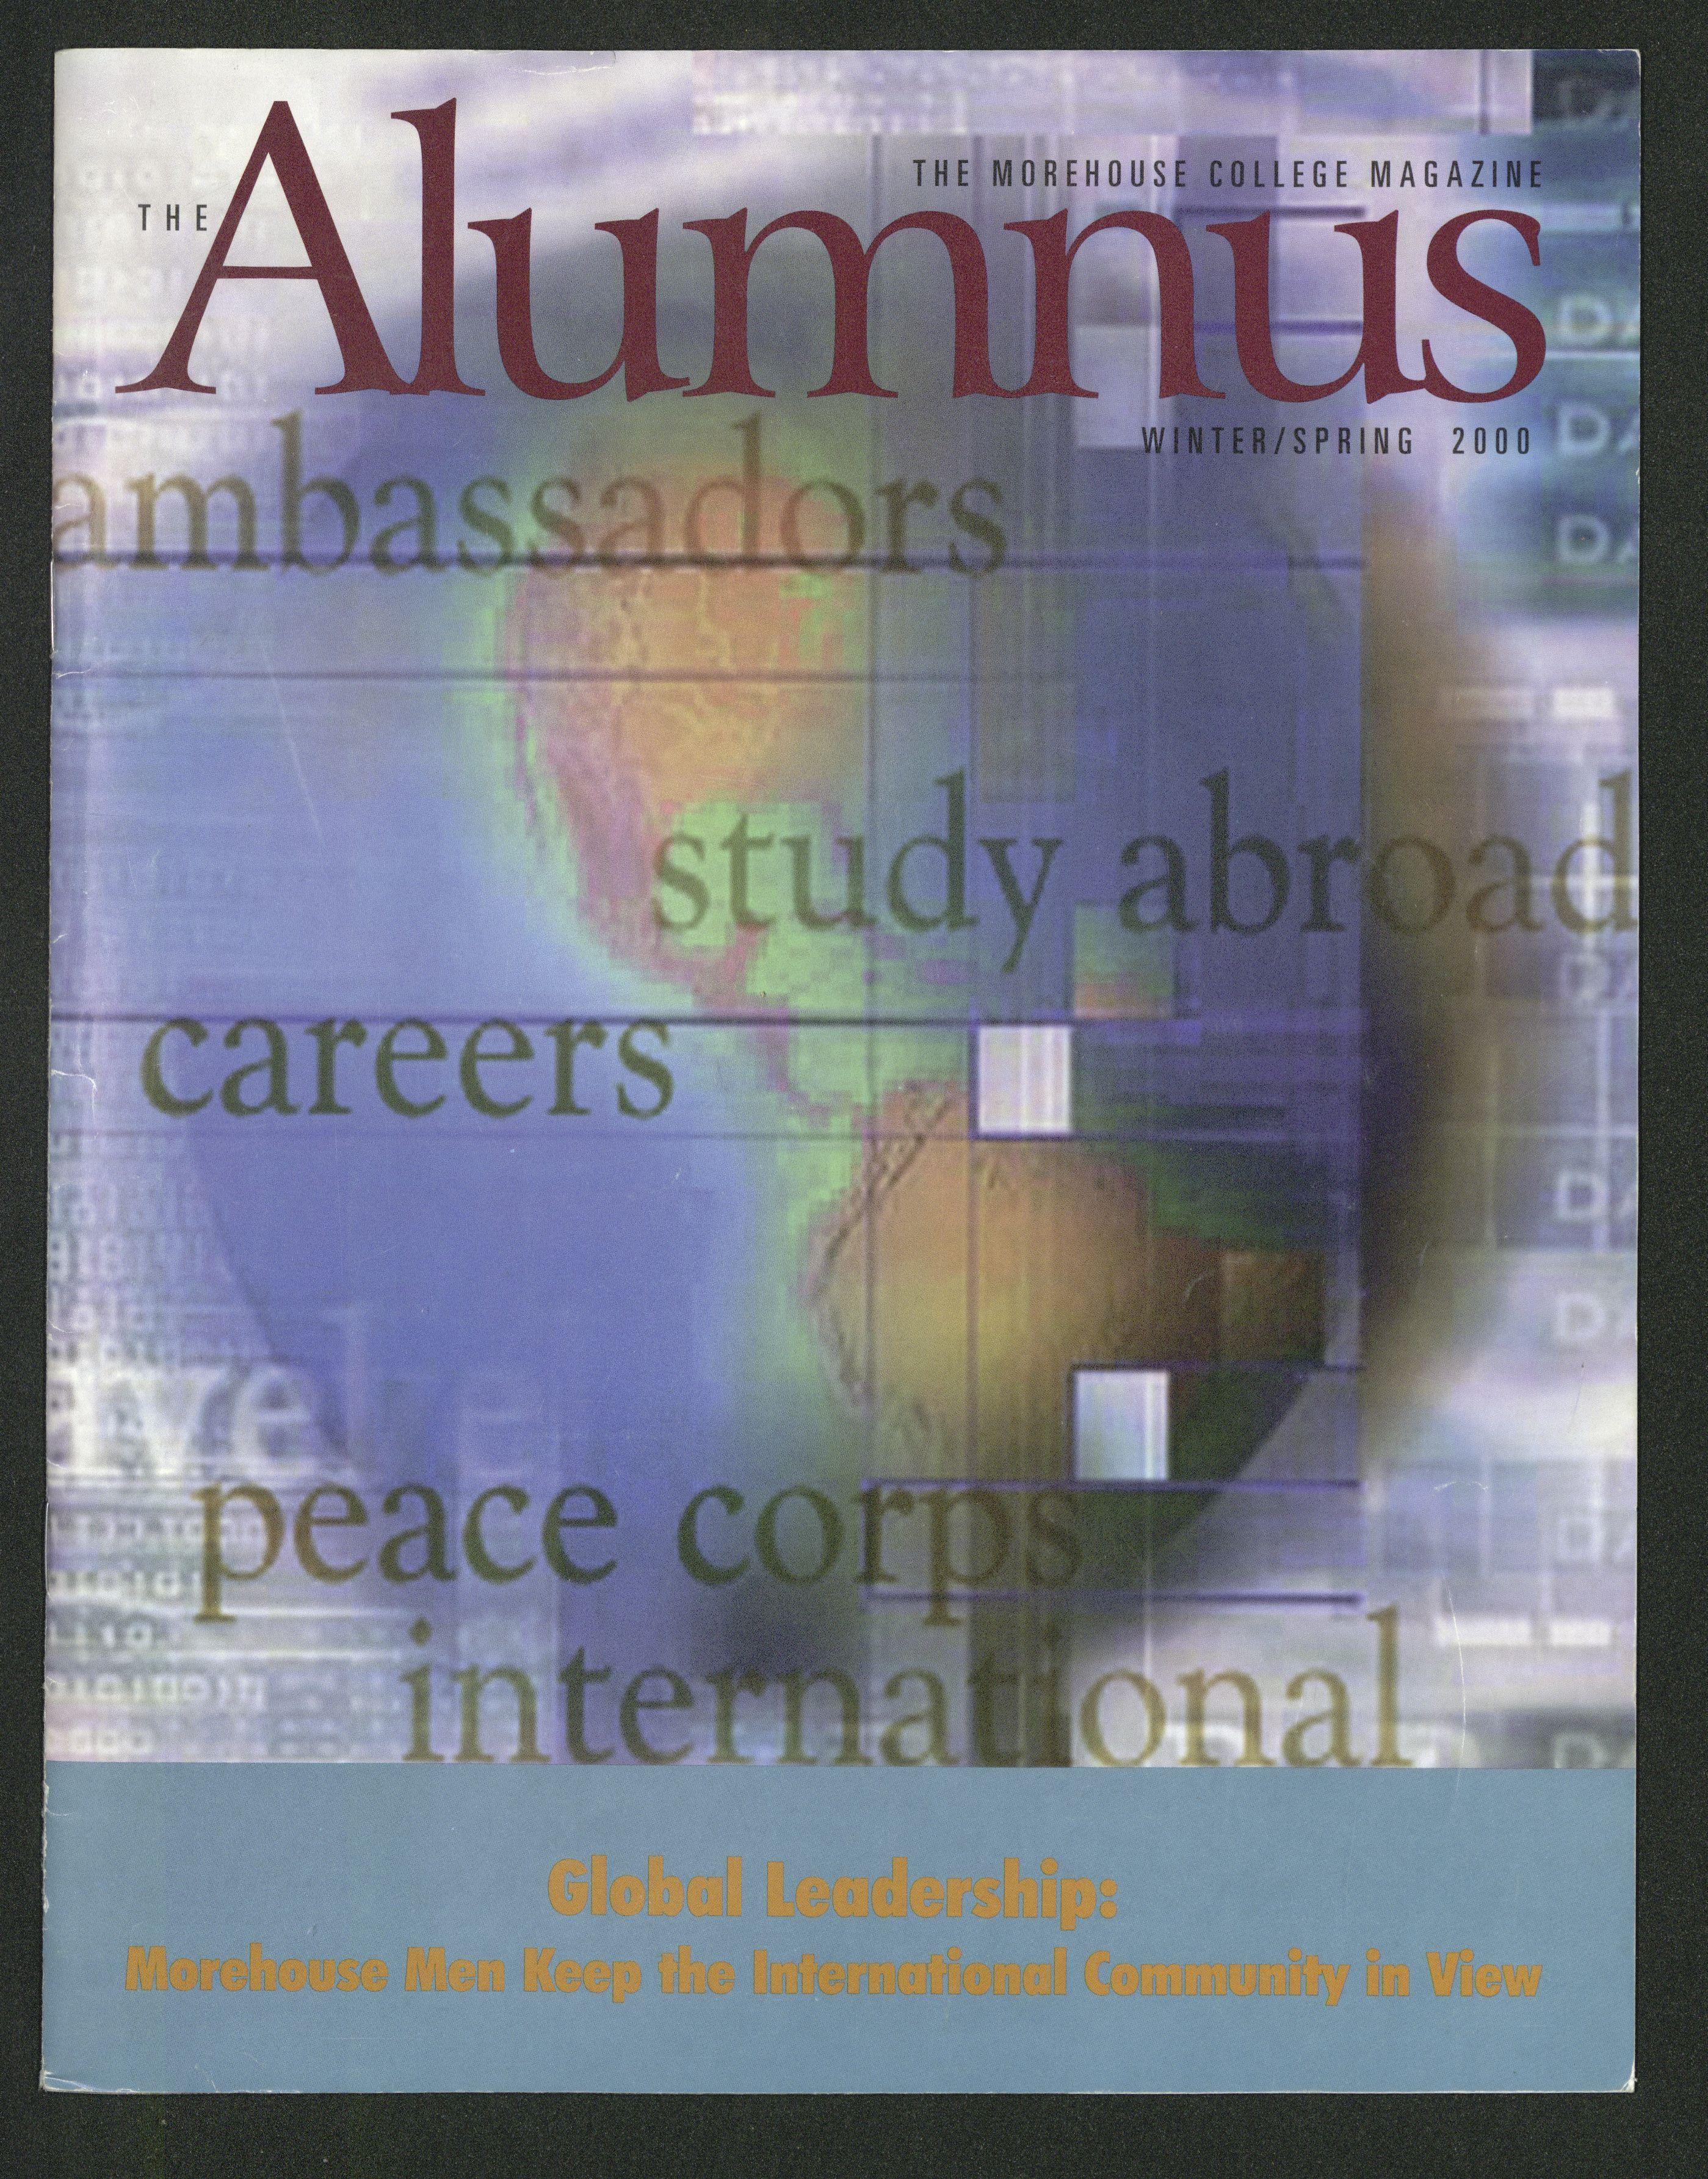 The Alumnus, Global Leadership: Morehouse Men Keep the International Community in View; 2000<br />